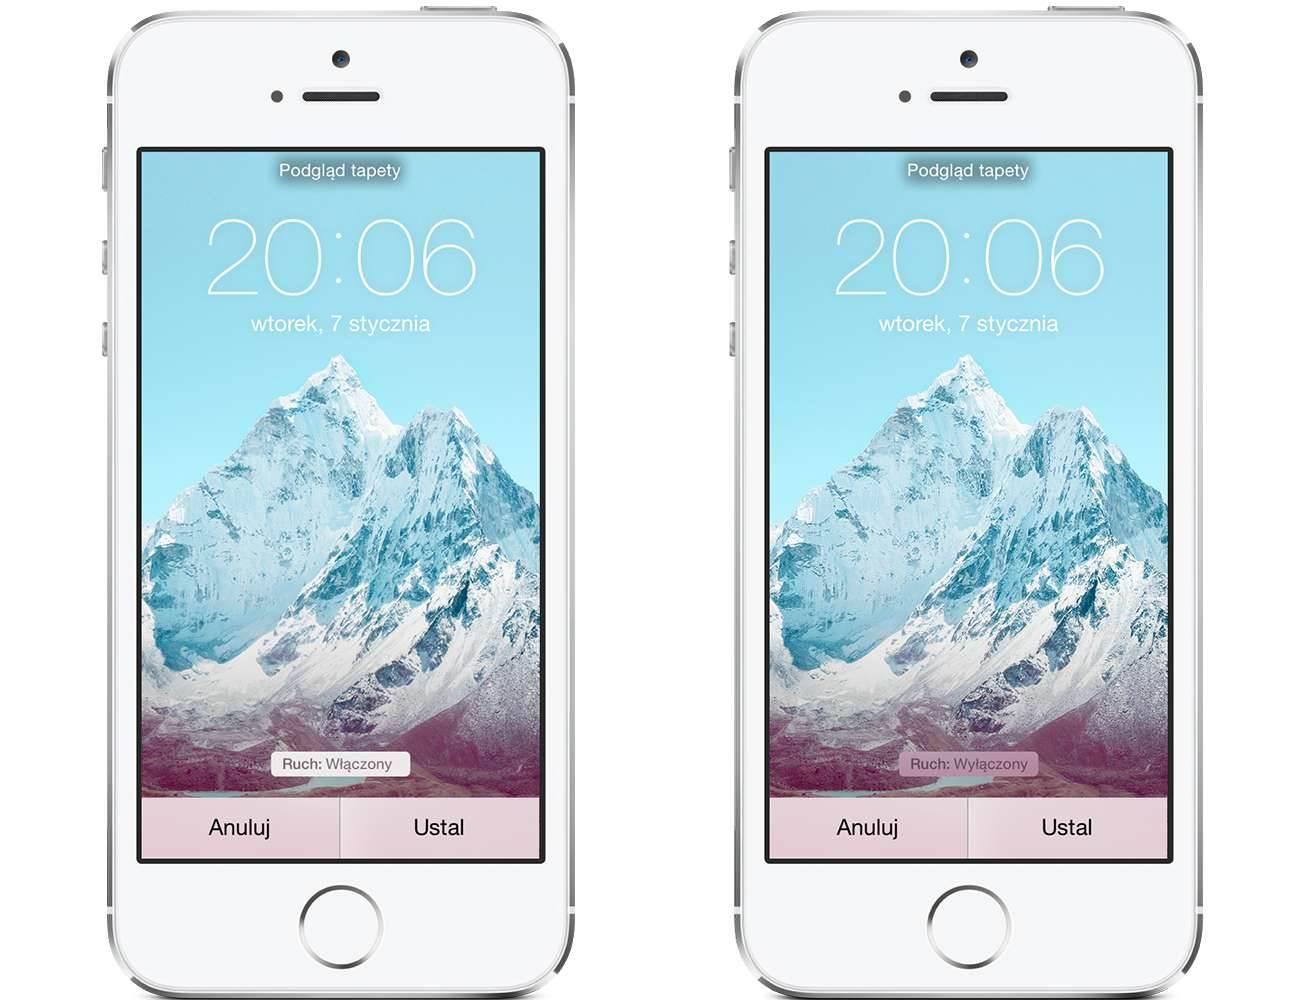 iOS7.1b3.6